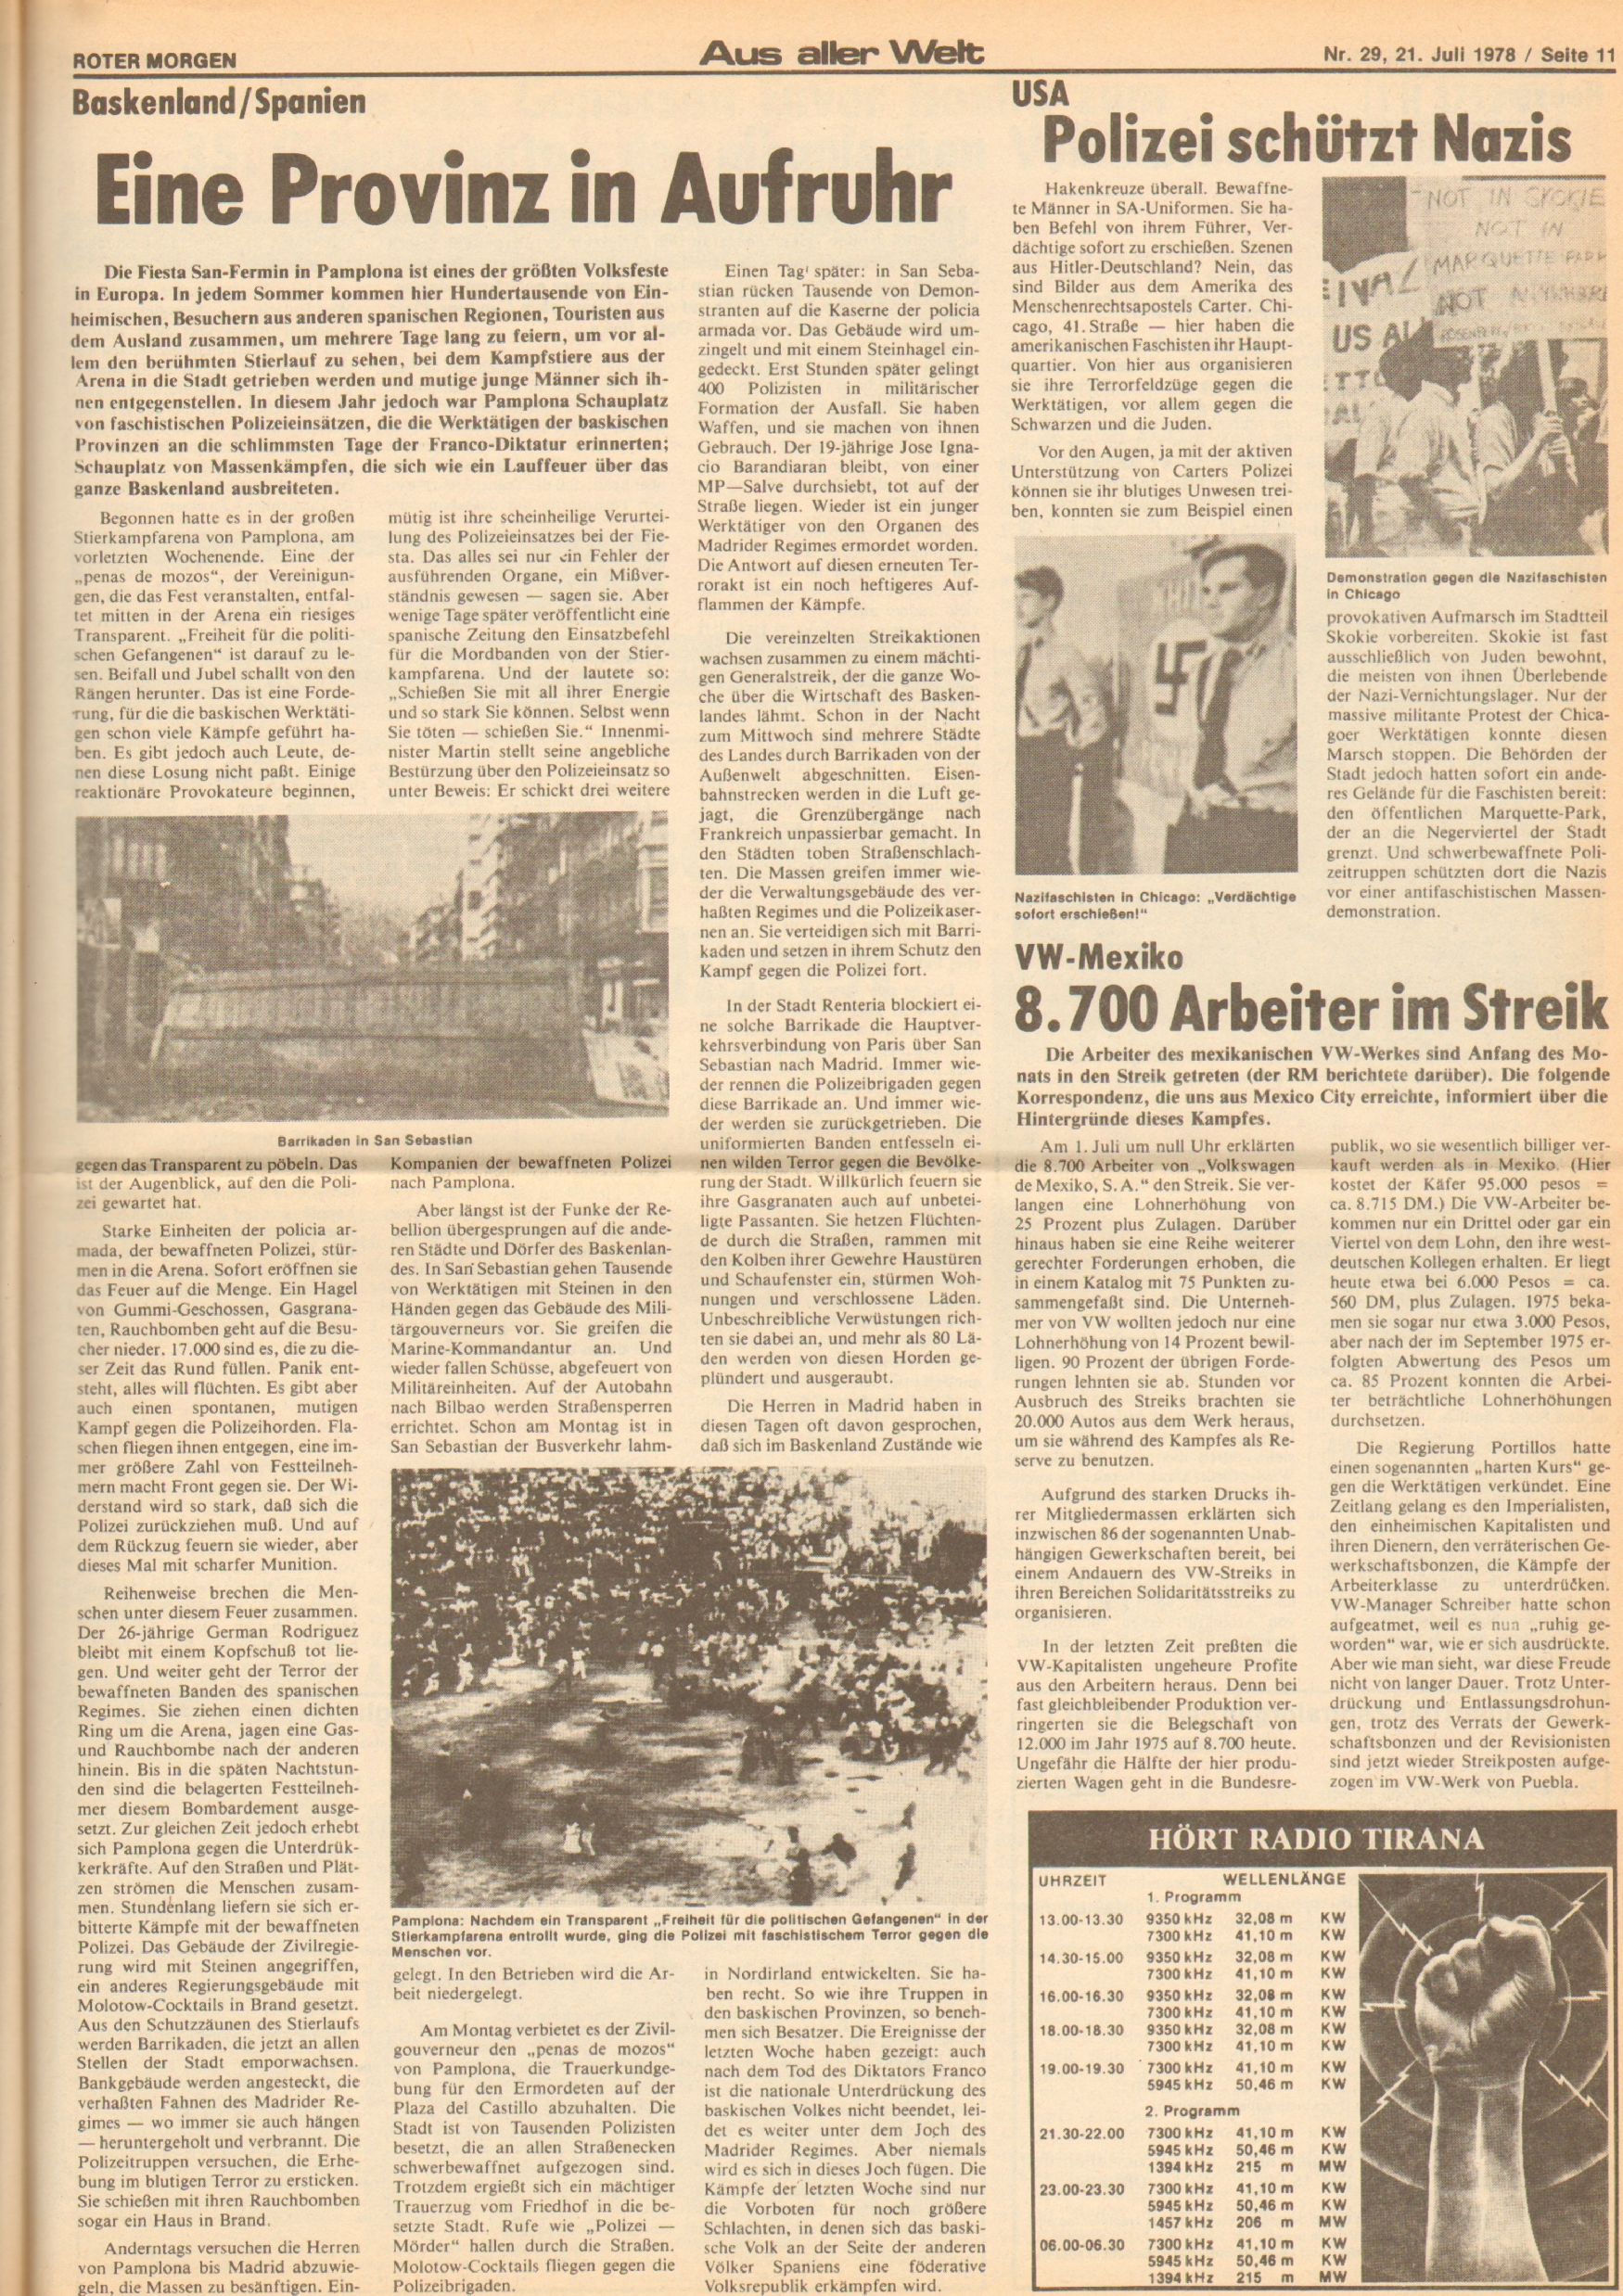 Roter Morgen, 12. Jg., 21. Juli 1978, Nr. 29, Seite 11